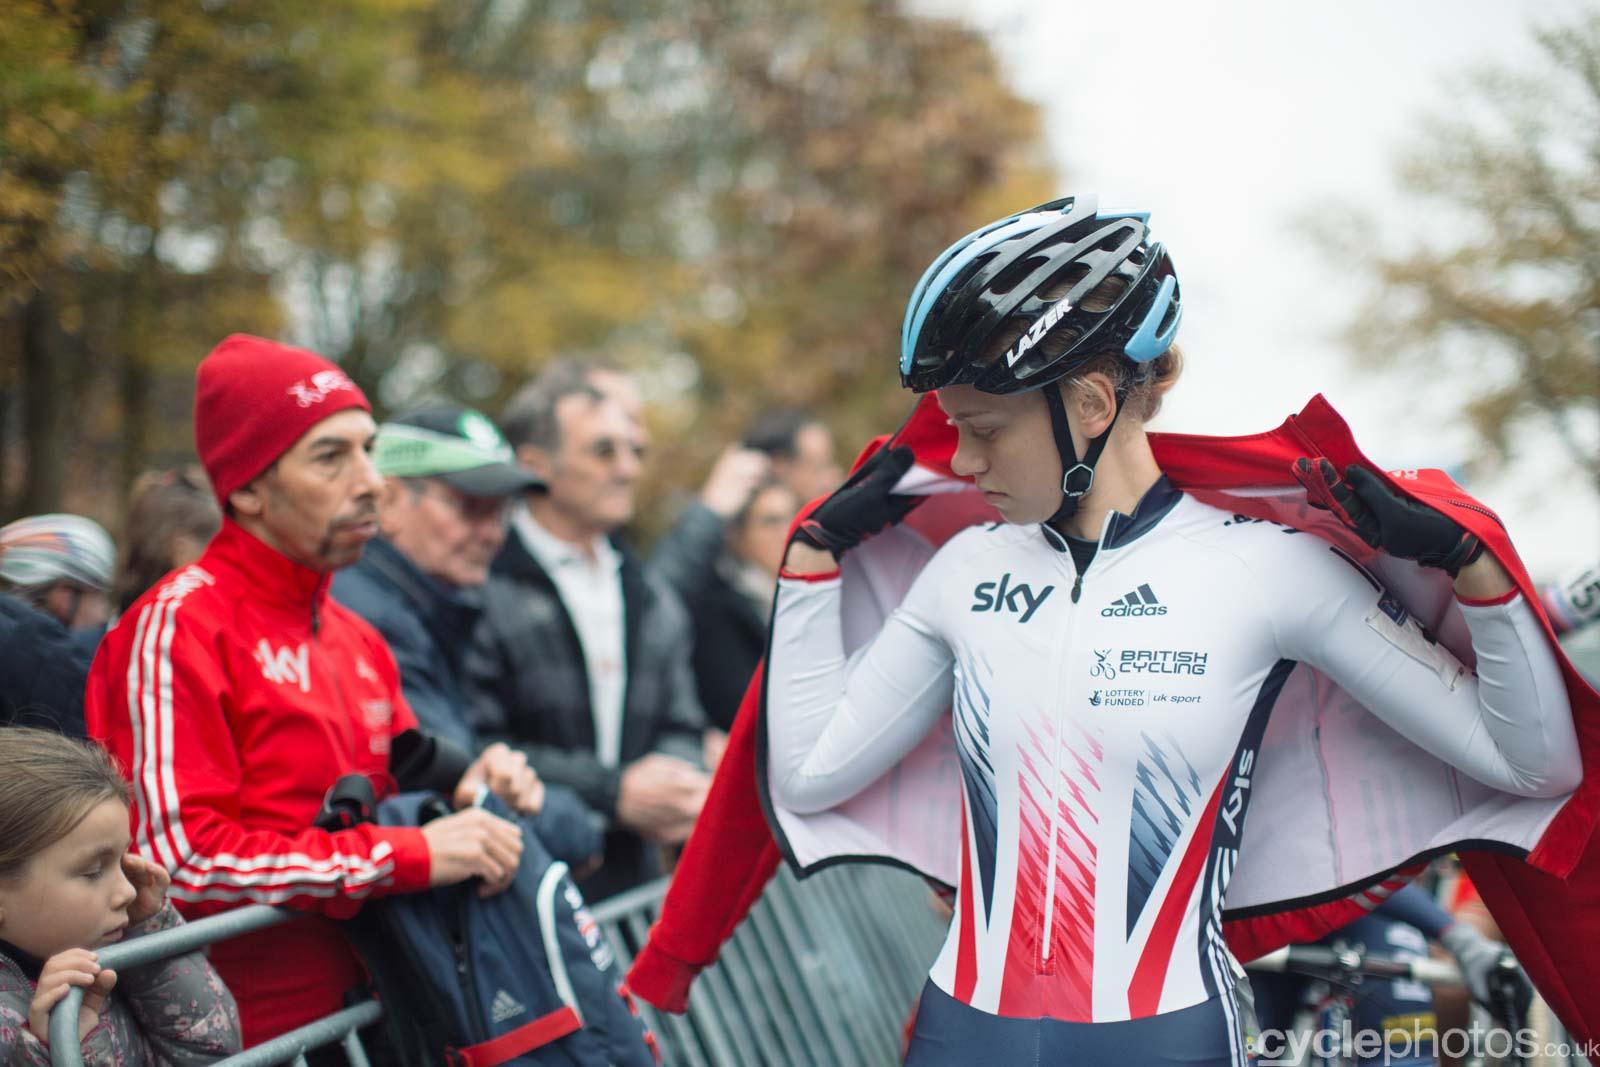 2015-cyclephotos-cyclocross-eucx-huijbergen-111254-amira-mellor